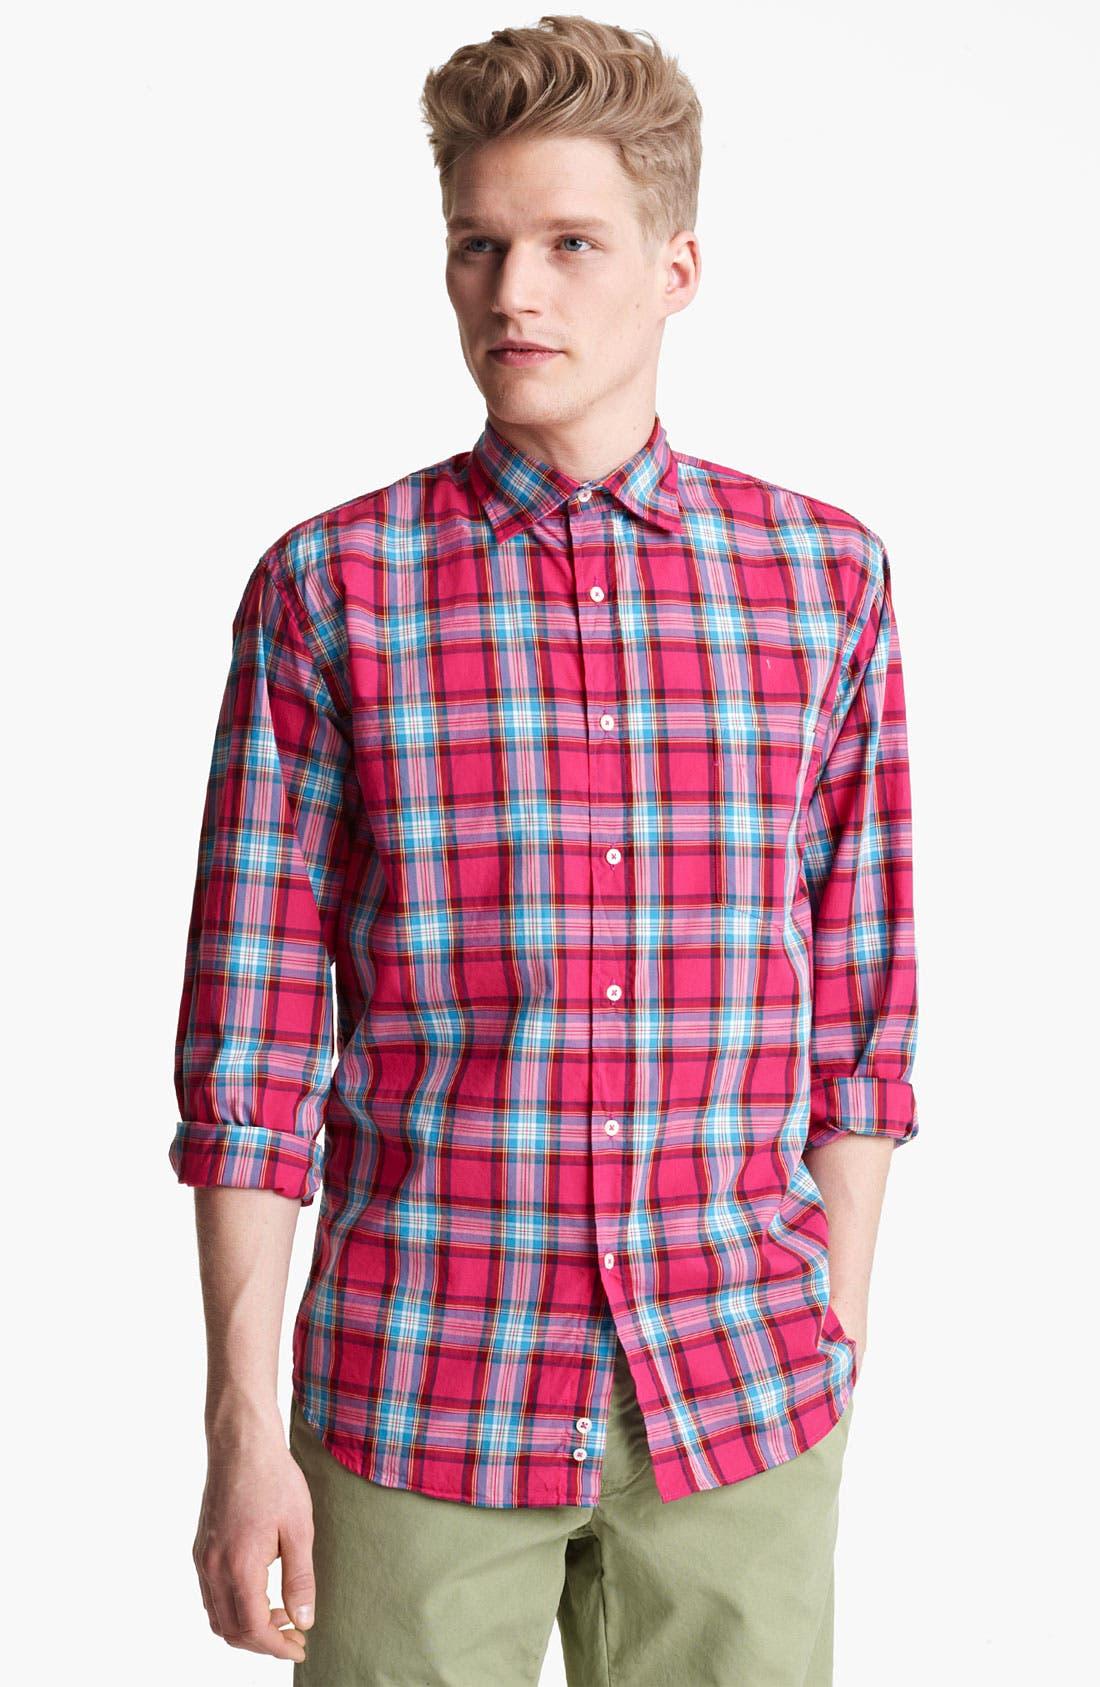 Alternate Image 1 Selected - Mason's Plaid Woven Shirt